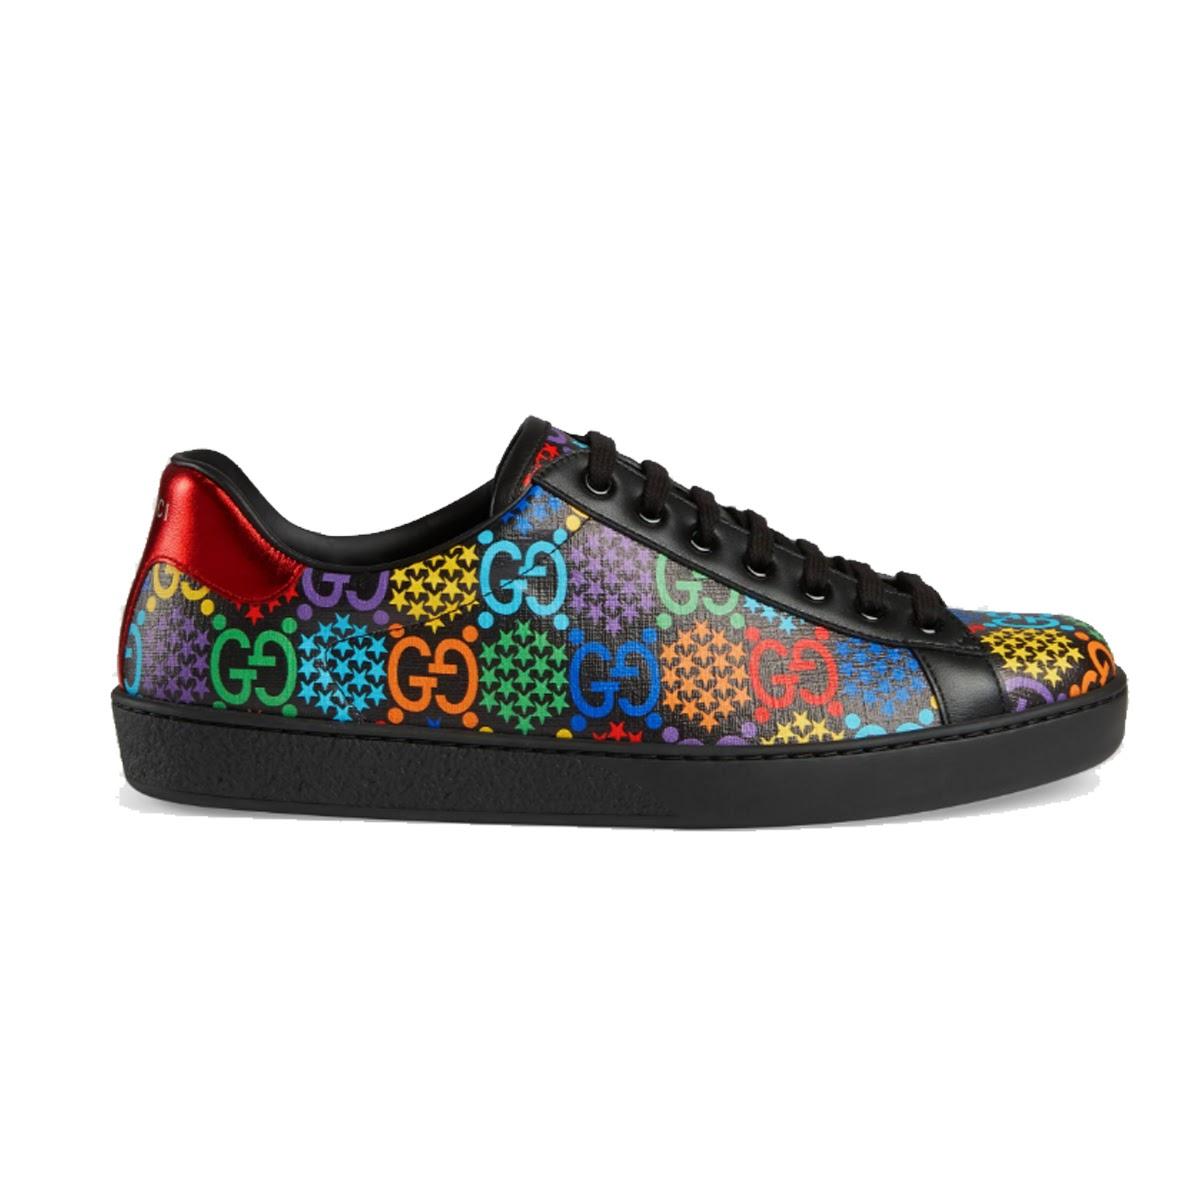 Gucci Men's GG Psychedelic Ace sneaker mang màu sắc nổi bật